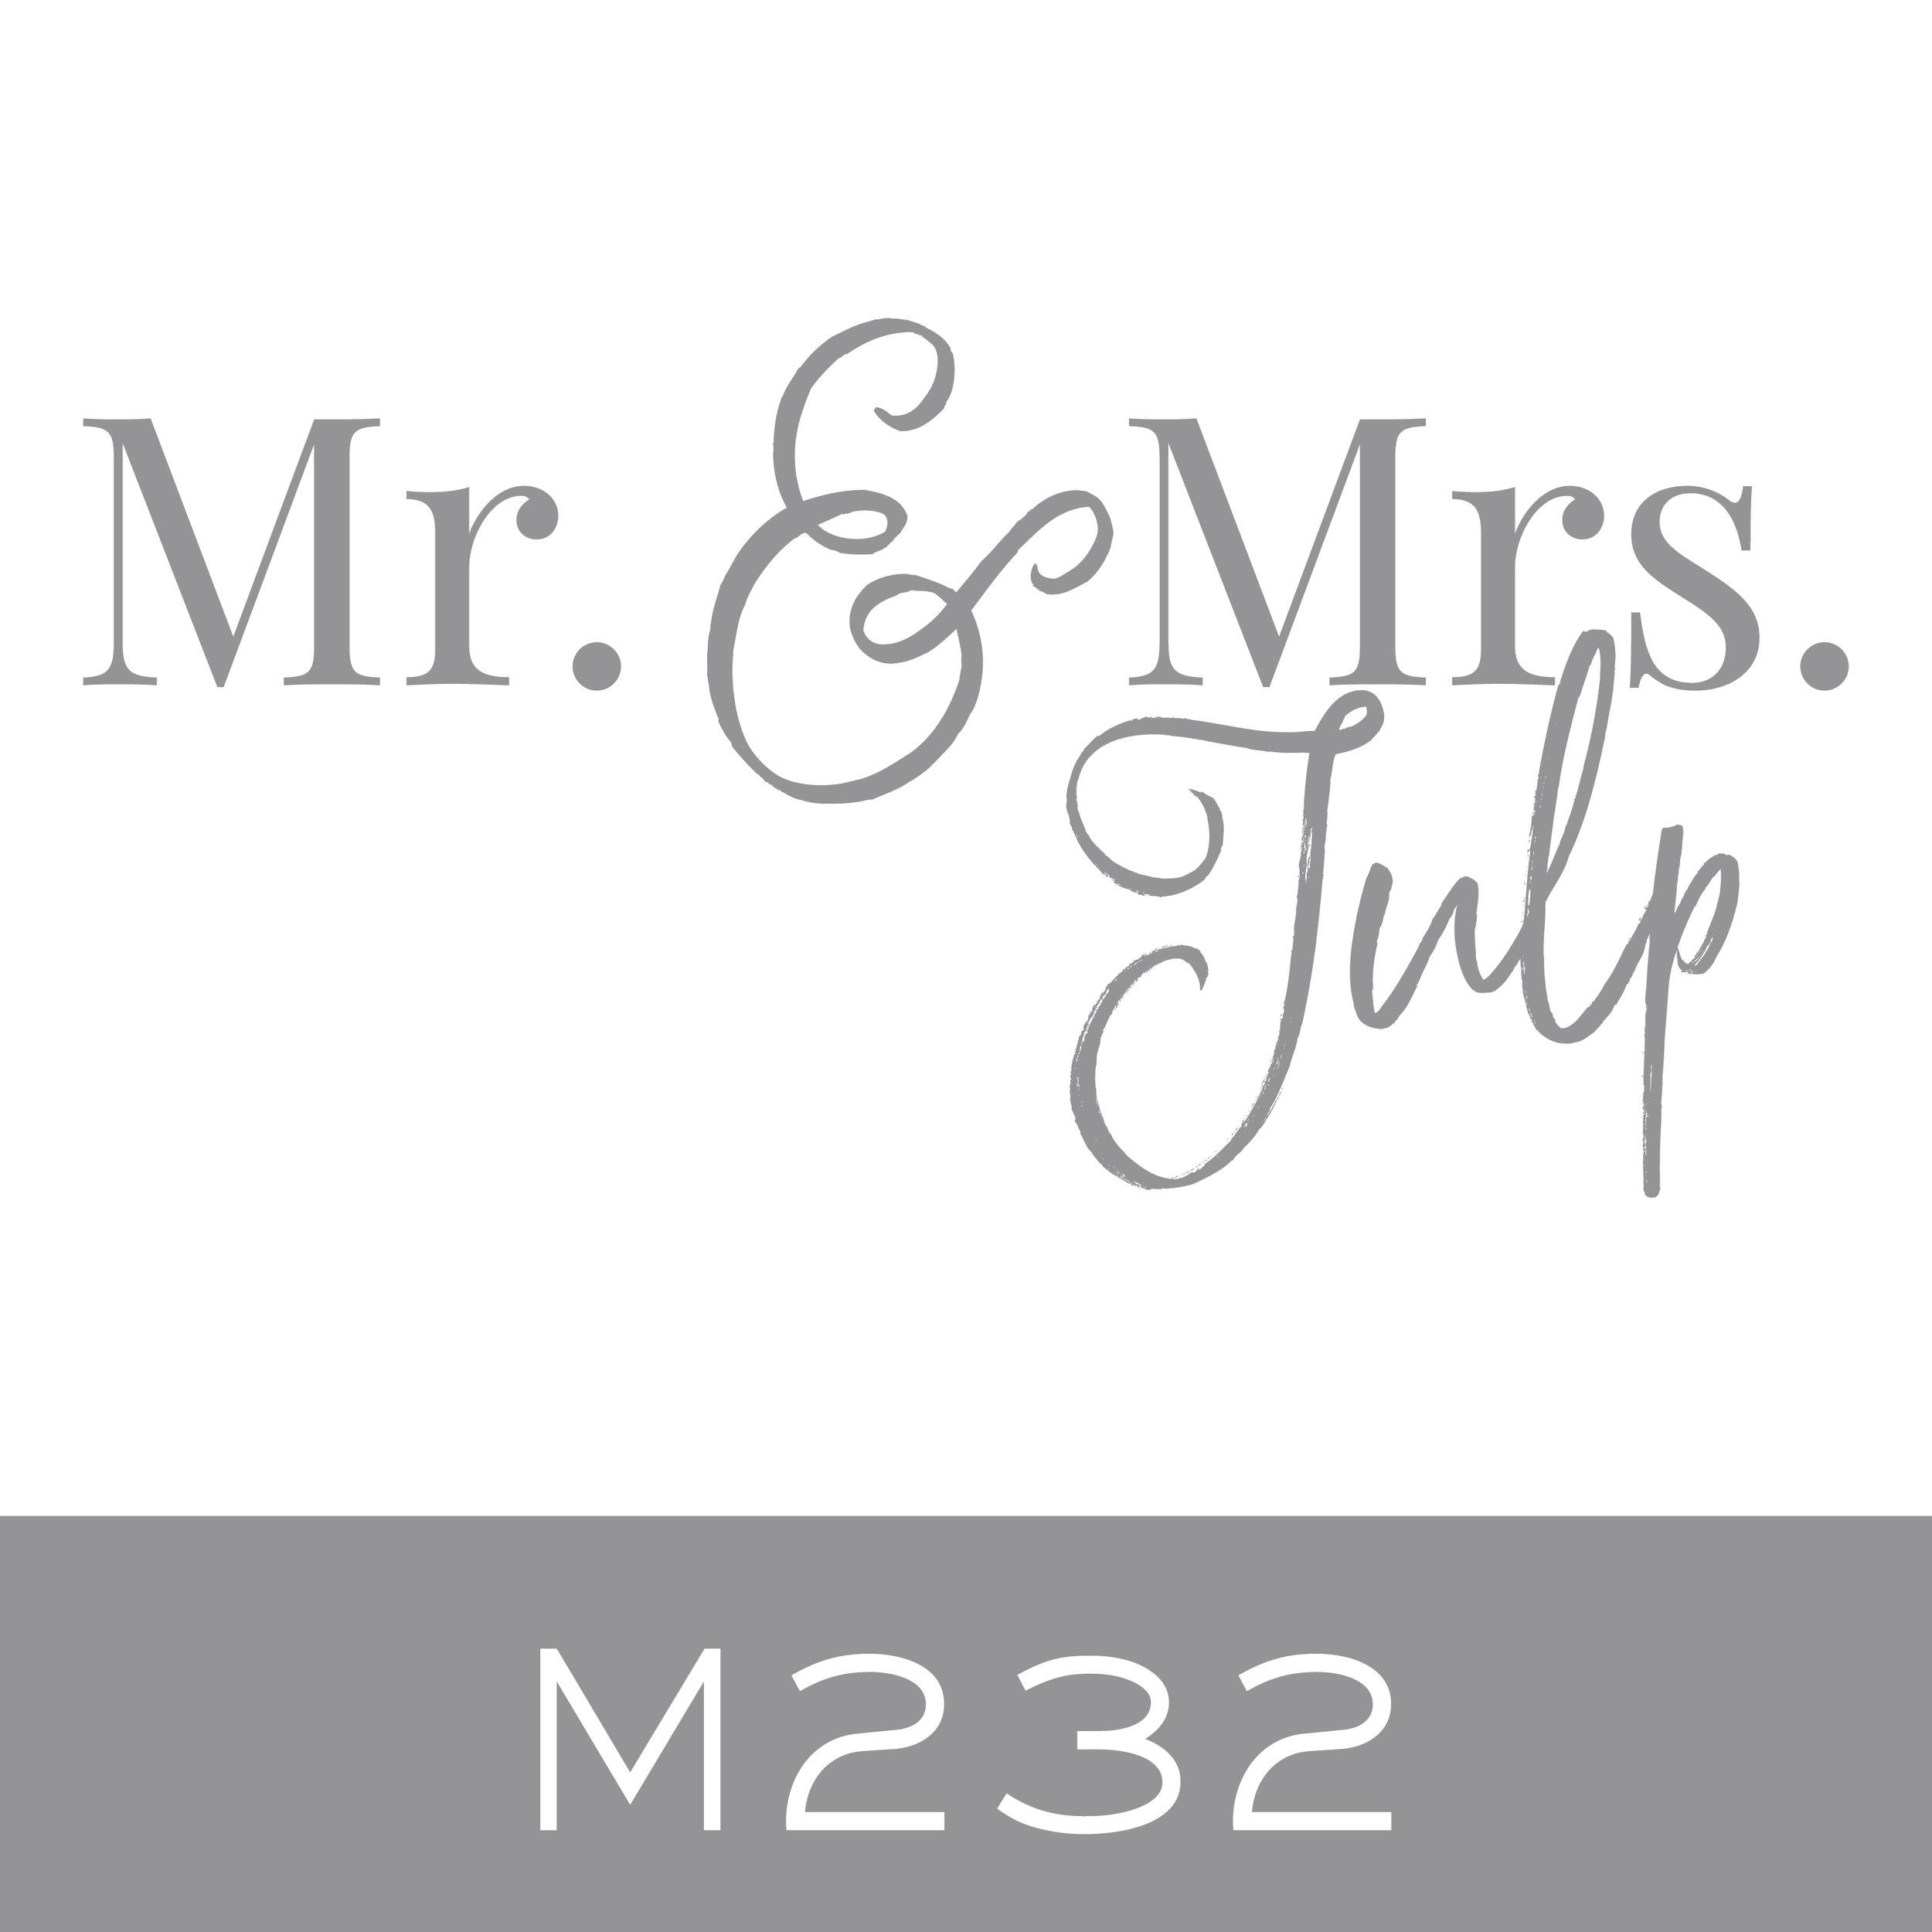 M232.jpg